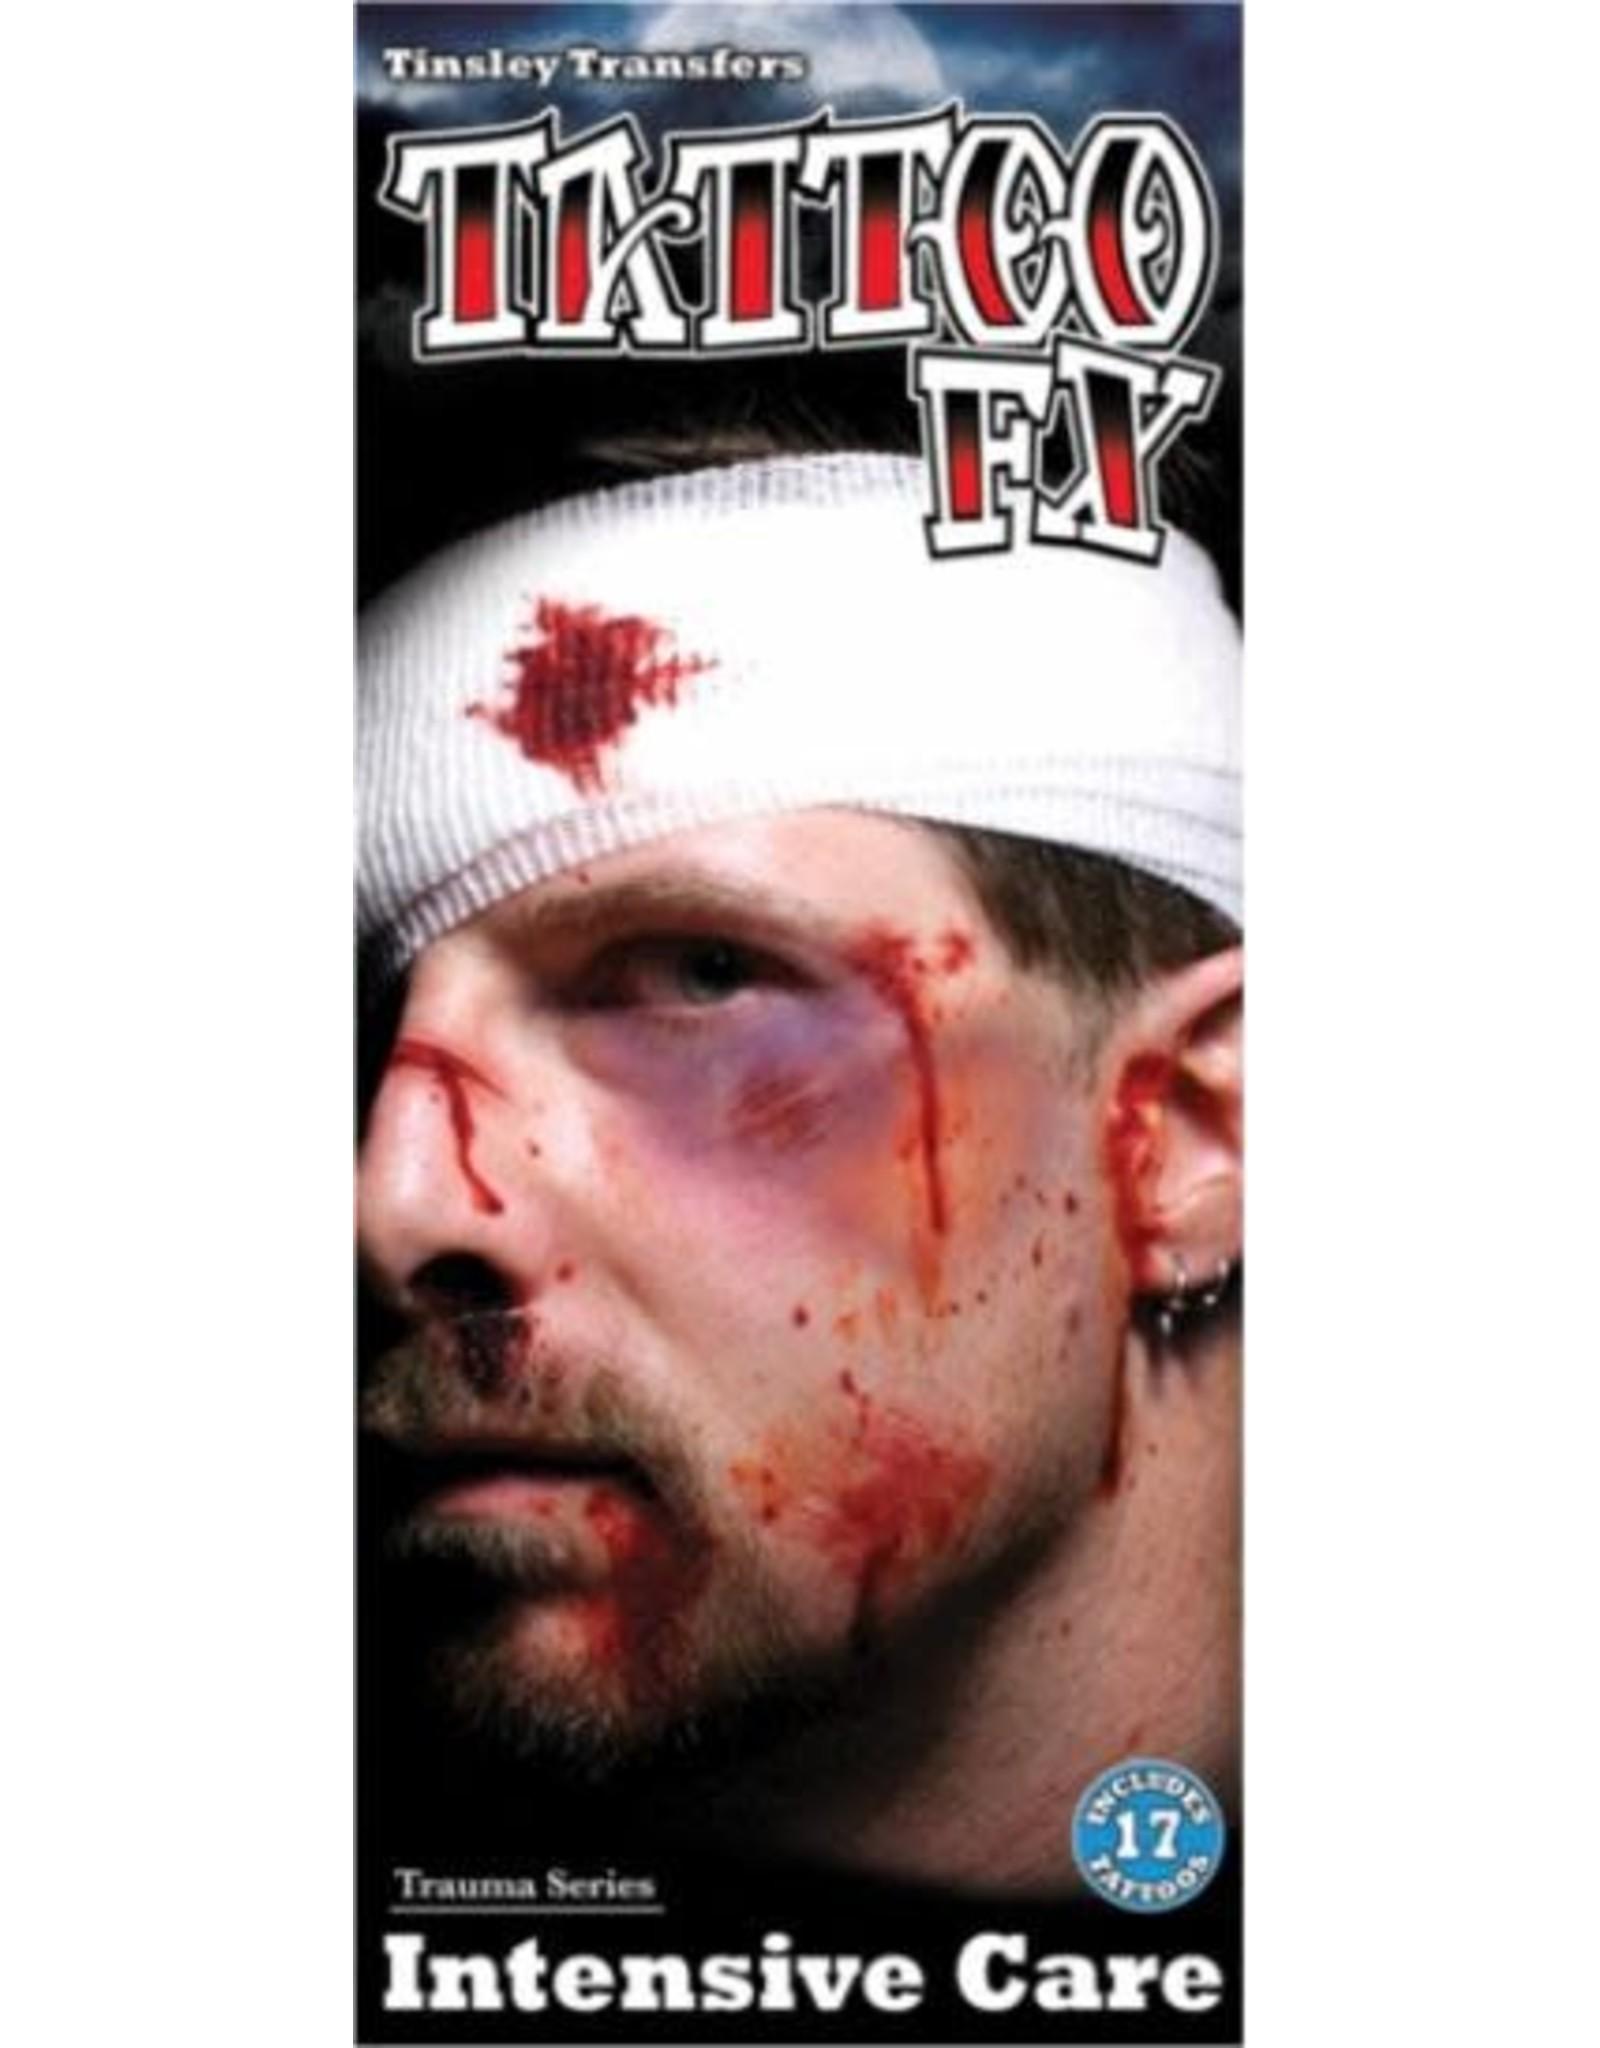 Tinsley Transfers Intensive Care Trauma Tattoo